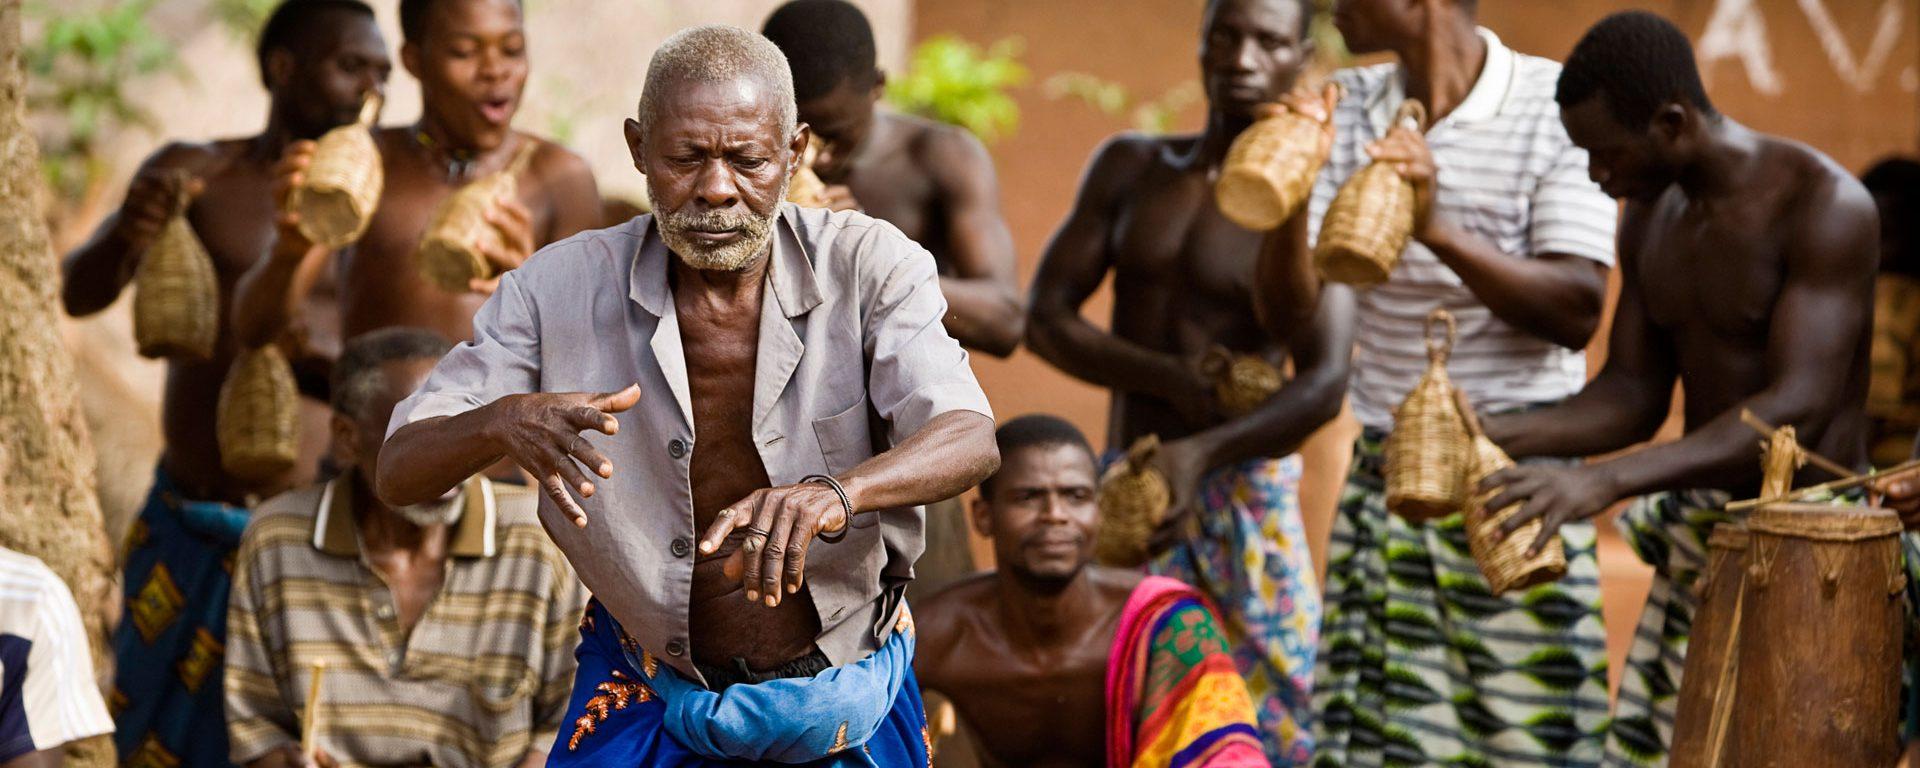 Village elder dancing with drummers during voodoo ceremony in Atitogan, Togo